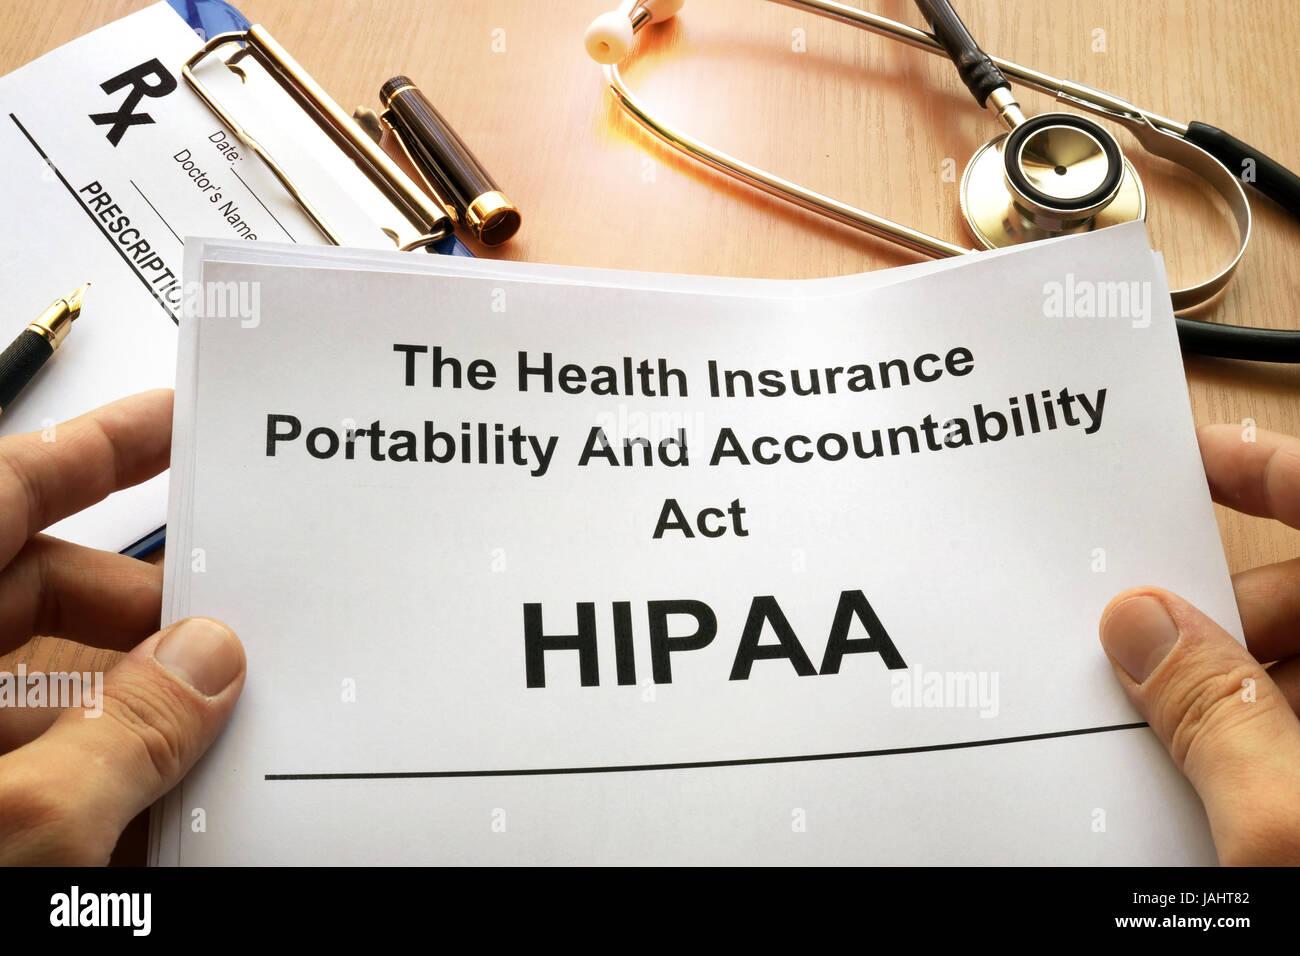 HIPAA.  The Health Insurance Portability and Accountability Act of 1996. - Stock Image